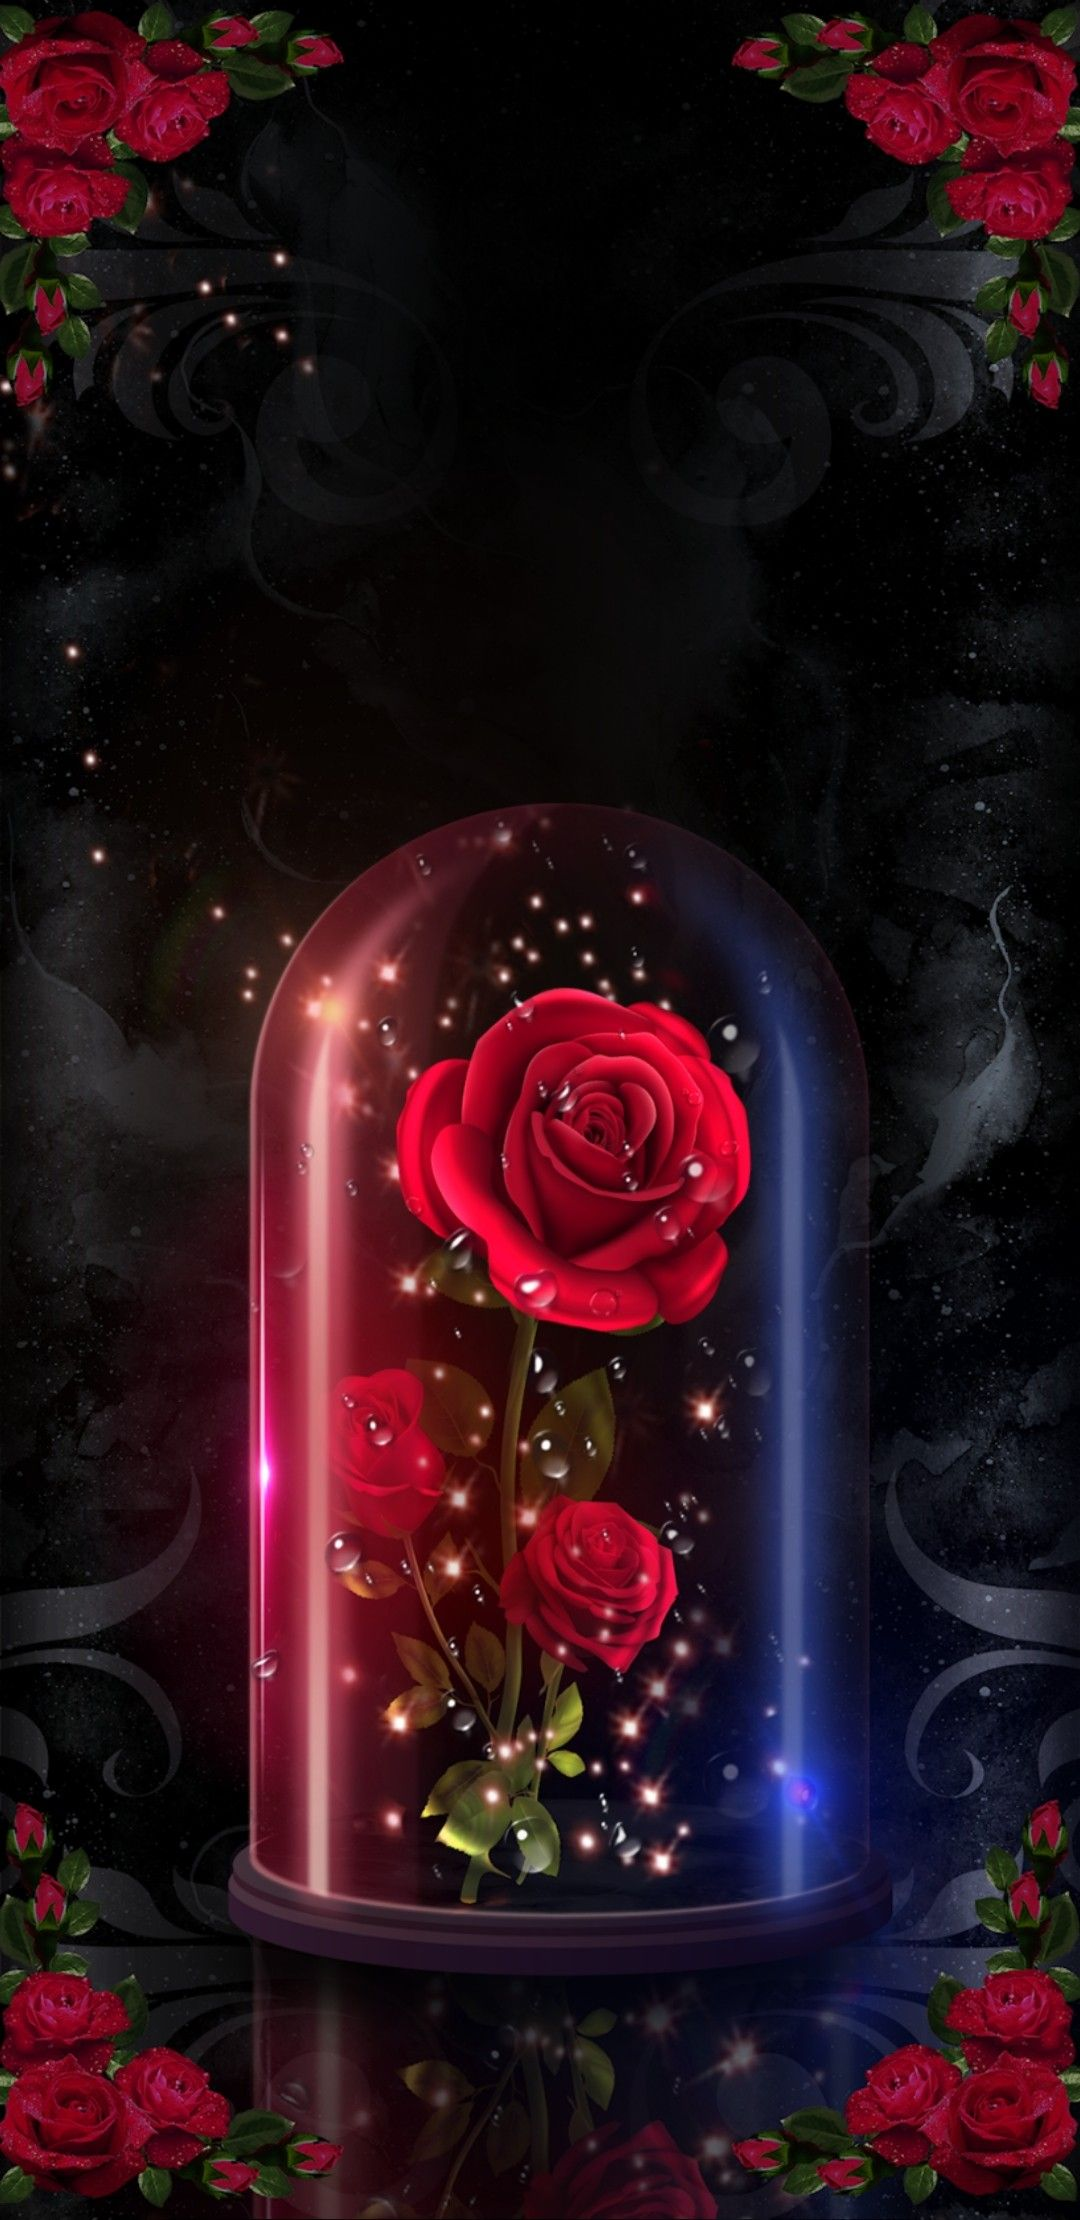 Pin By Gisella Maldonado On Roses Wallpaper 2 Rose Flower Wallpaper Flower Wallpaper Rose Wallpaper